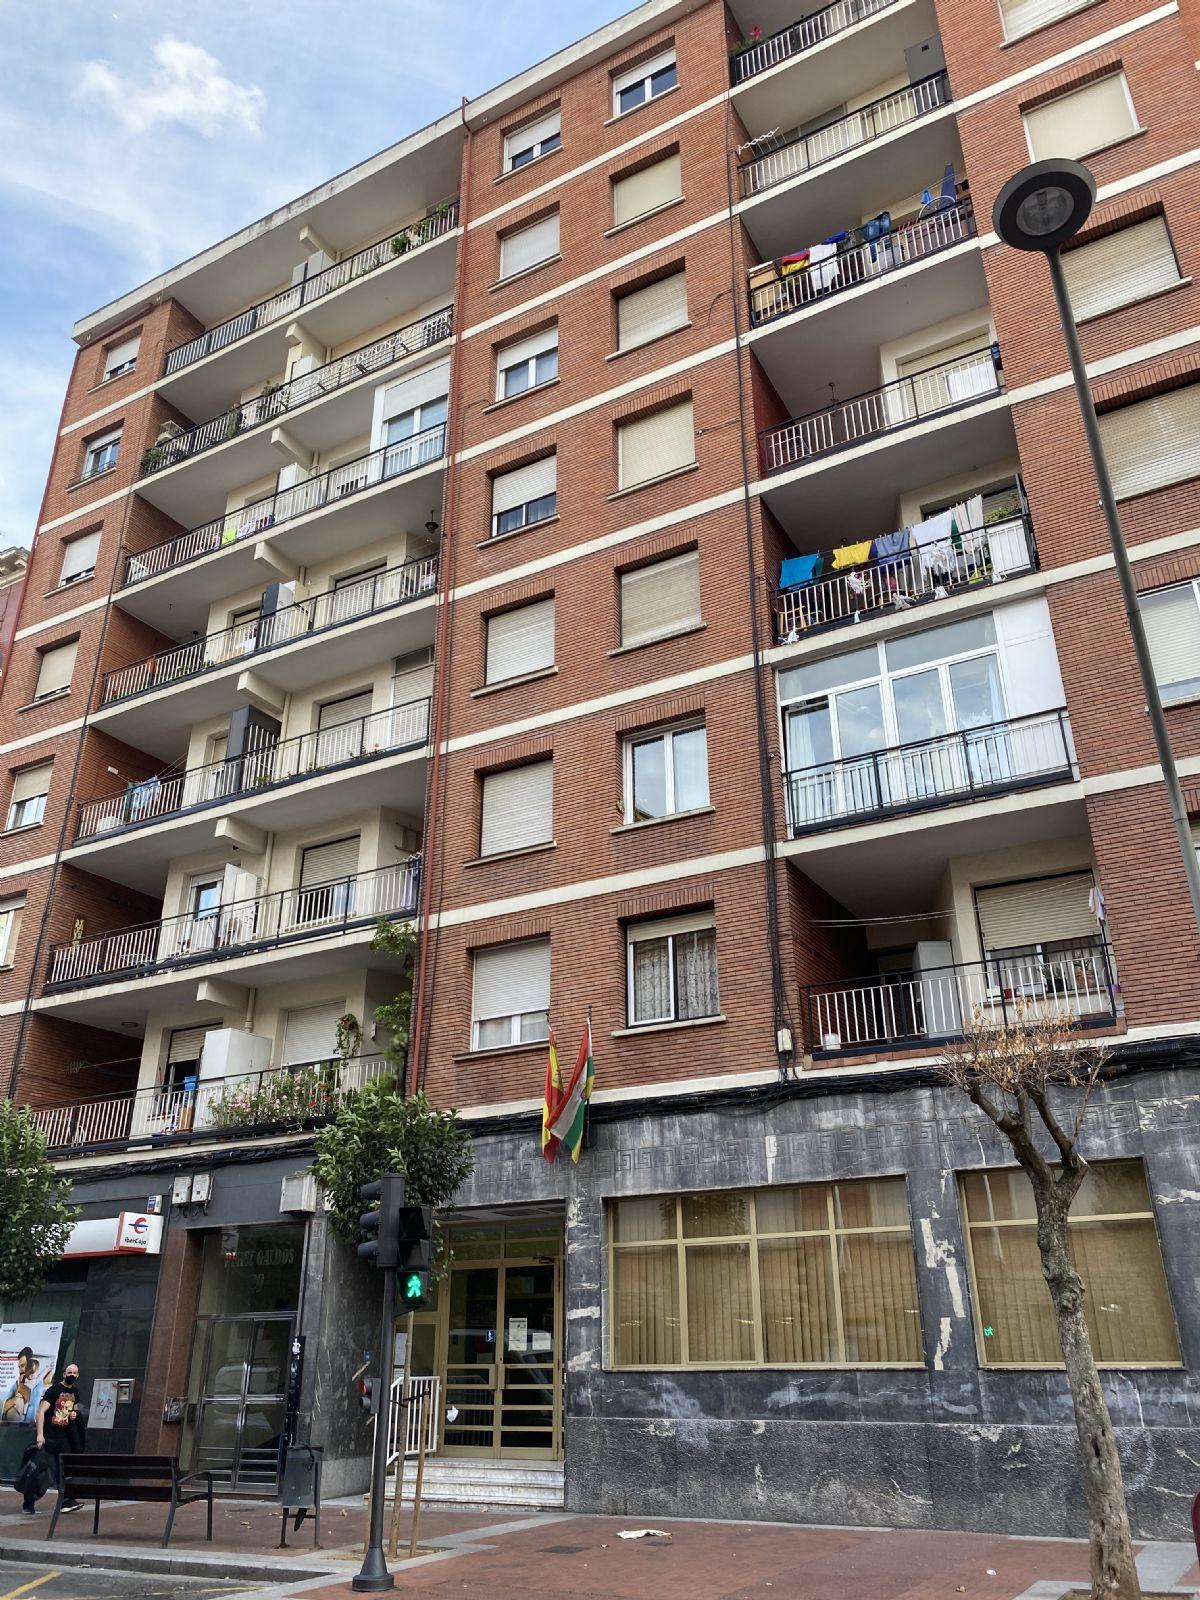 Piso en venta en Logroño, La Rioja, Avenida Pérez Galdós, 129.000 €, 3 habitaciones, 1 baño, 99 m2